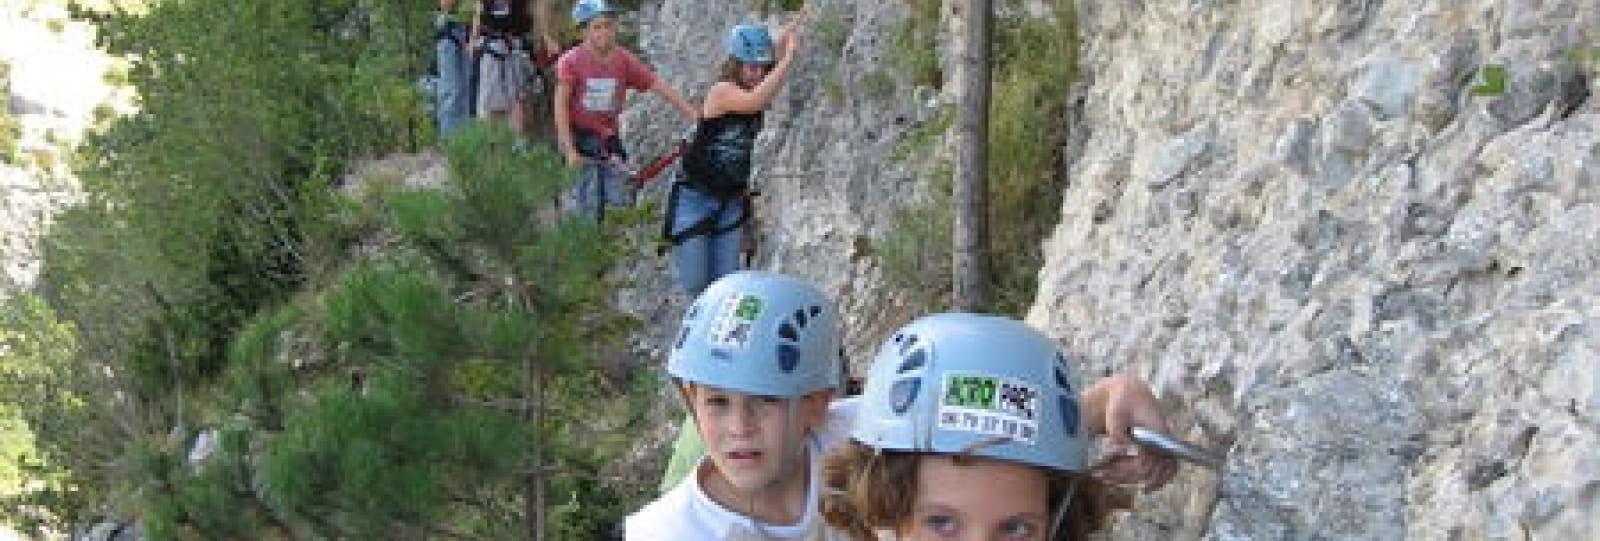 Via Ferrata avec la Base de Loisirs Drôme Aventure